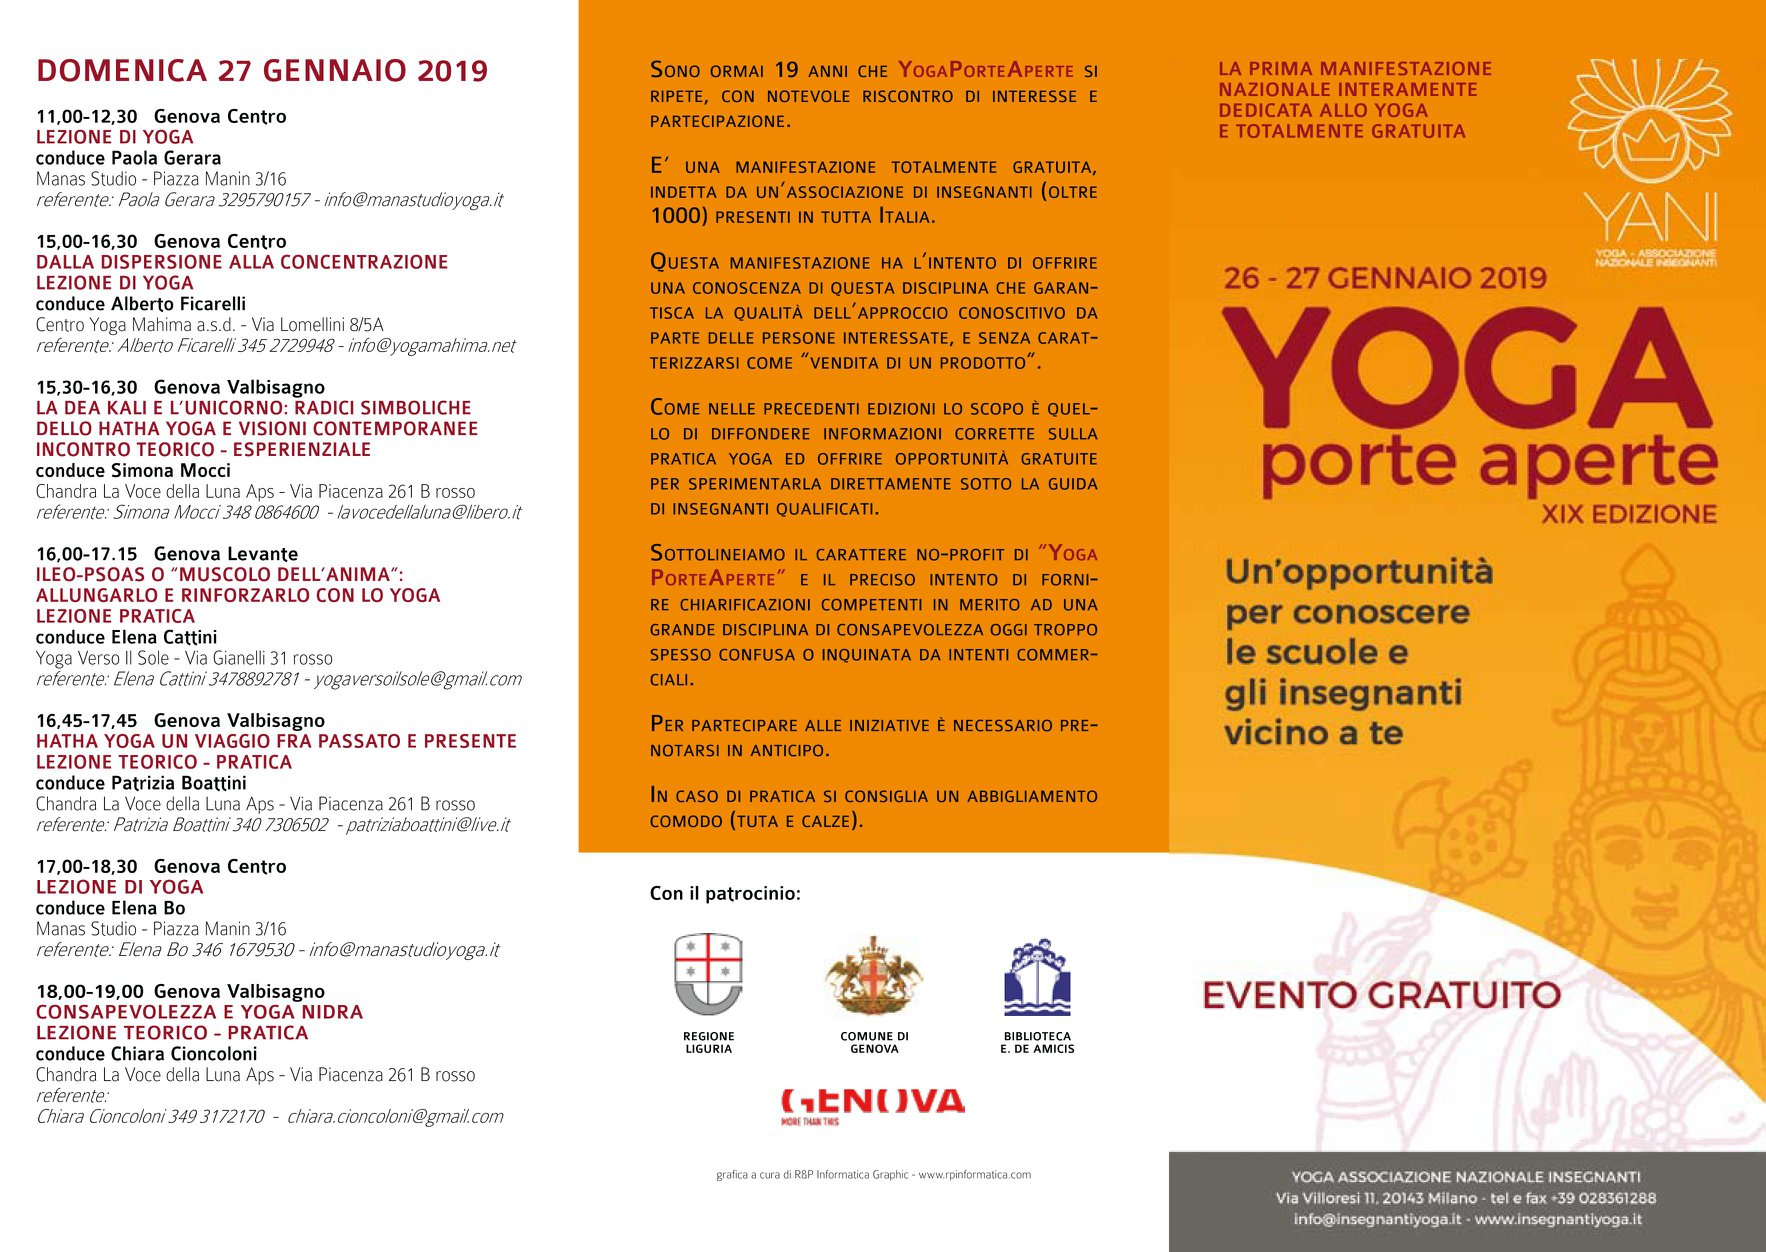 YOGA Porte Aperte XIX EDIZIONE    Genova 26-27 Gennaio 2019